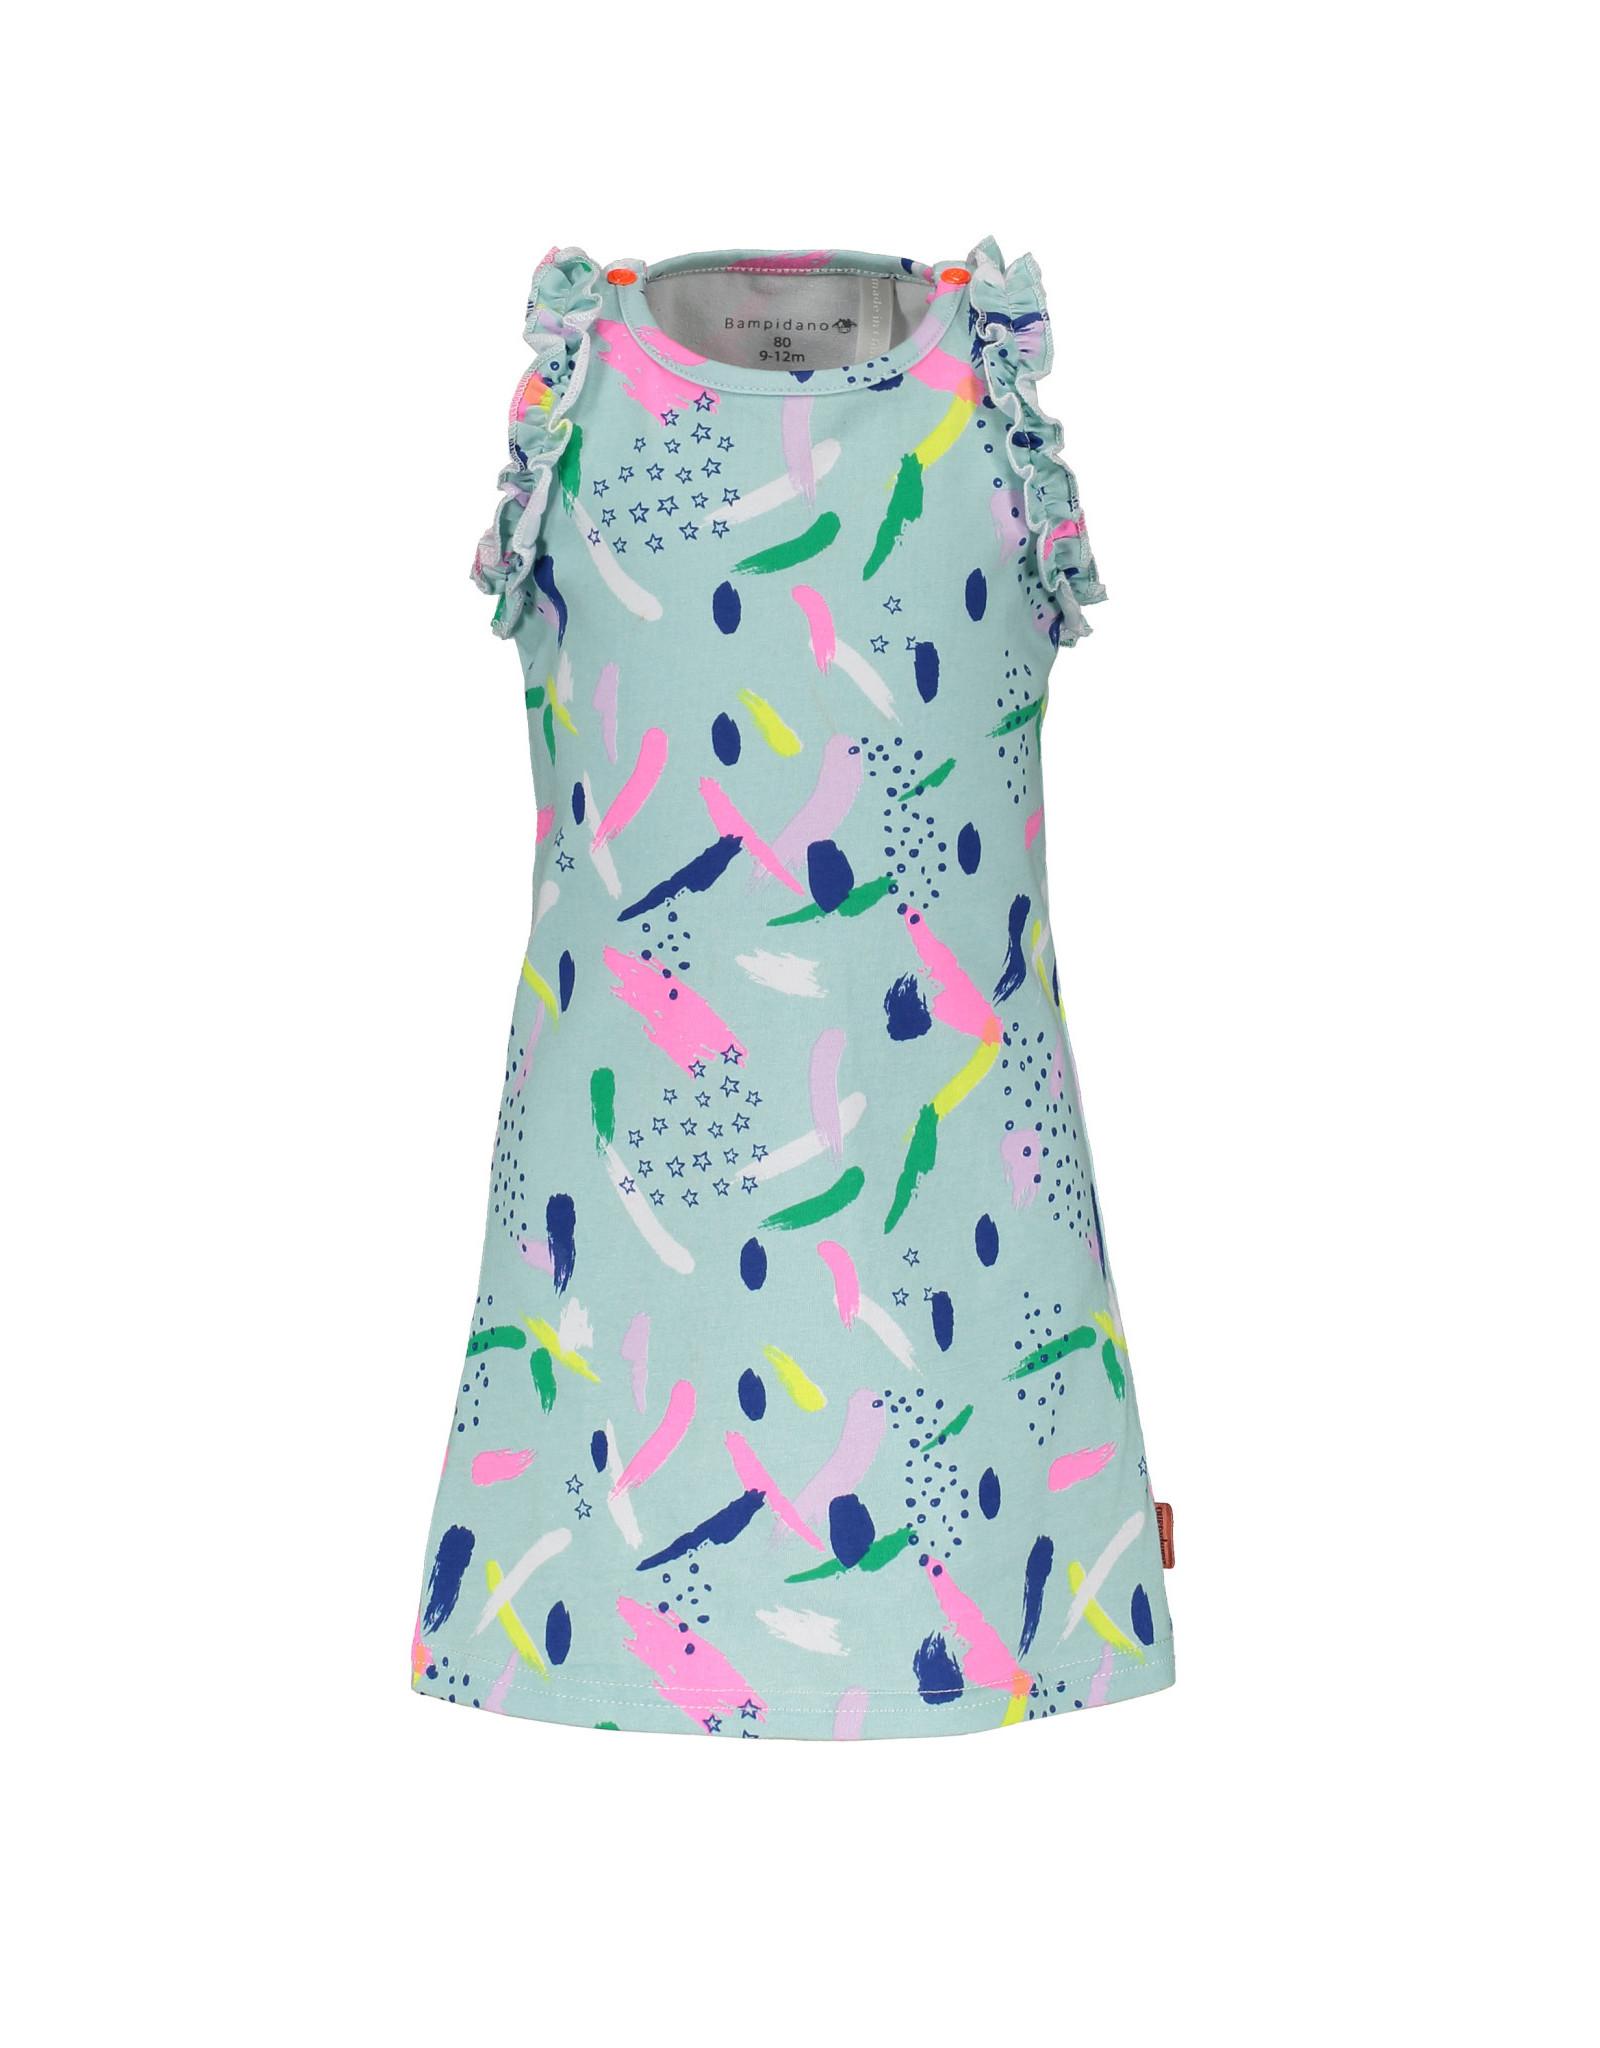 Bampidano Bampidano baby meisjes jurk Eloise Blue Allover